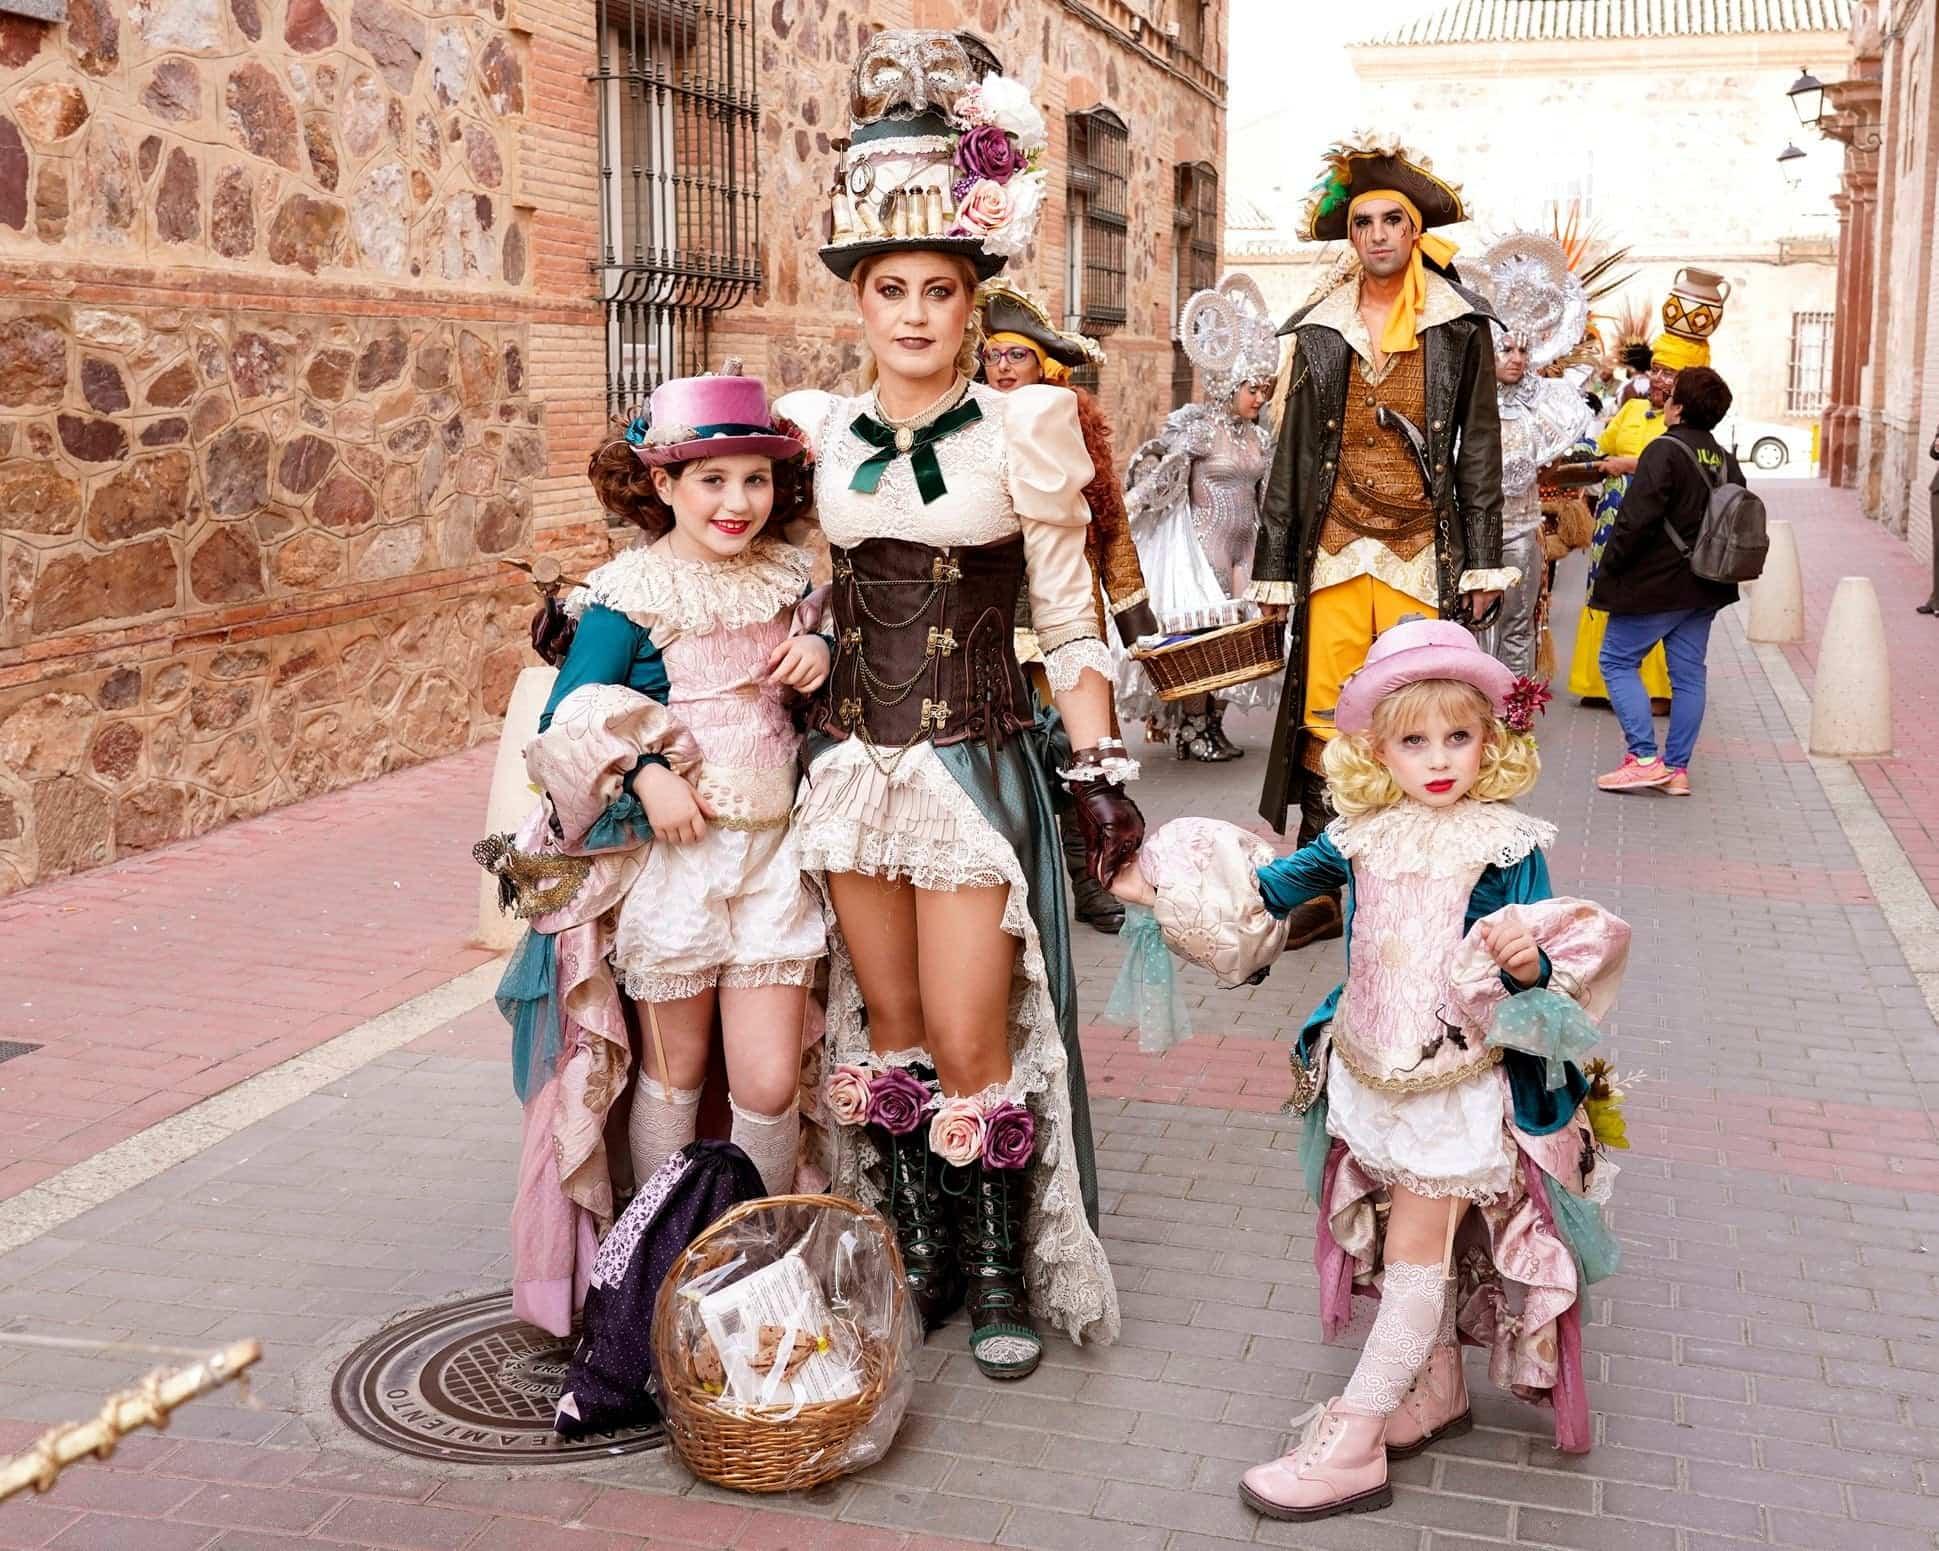 Carnaval de herencia 2020 ofertorio 107 - Selección de fotografías del Ofertorio del Carnaval de Herencia